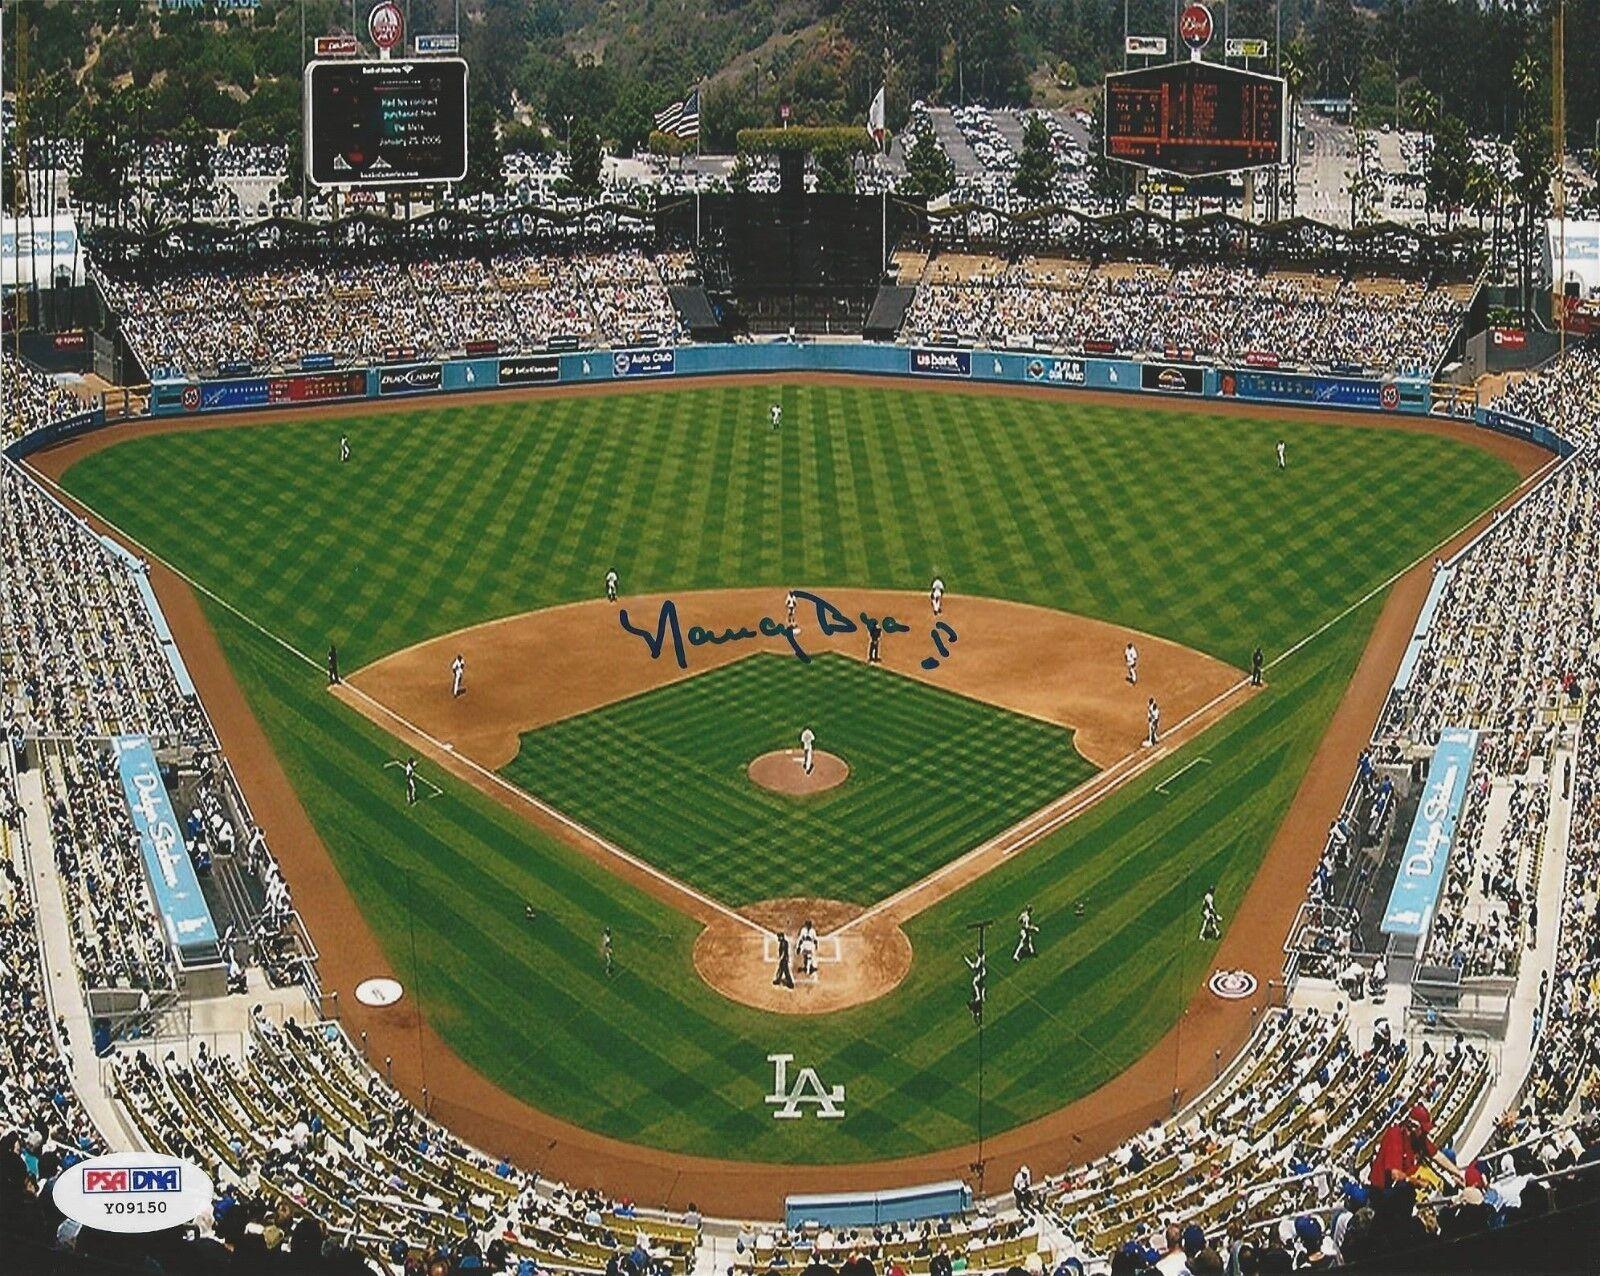 Nancy Bea Hefley Dodgers Stadium Signed 8x10 Photo PSA/DNA # Y09150